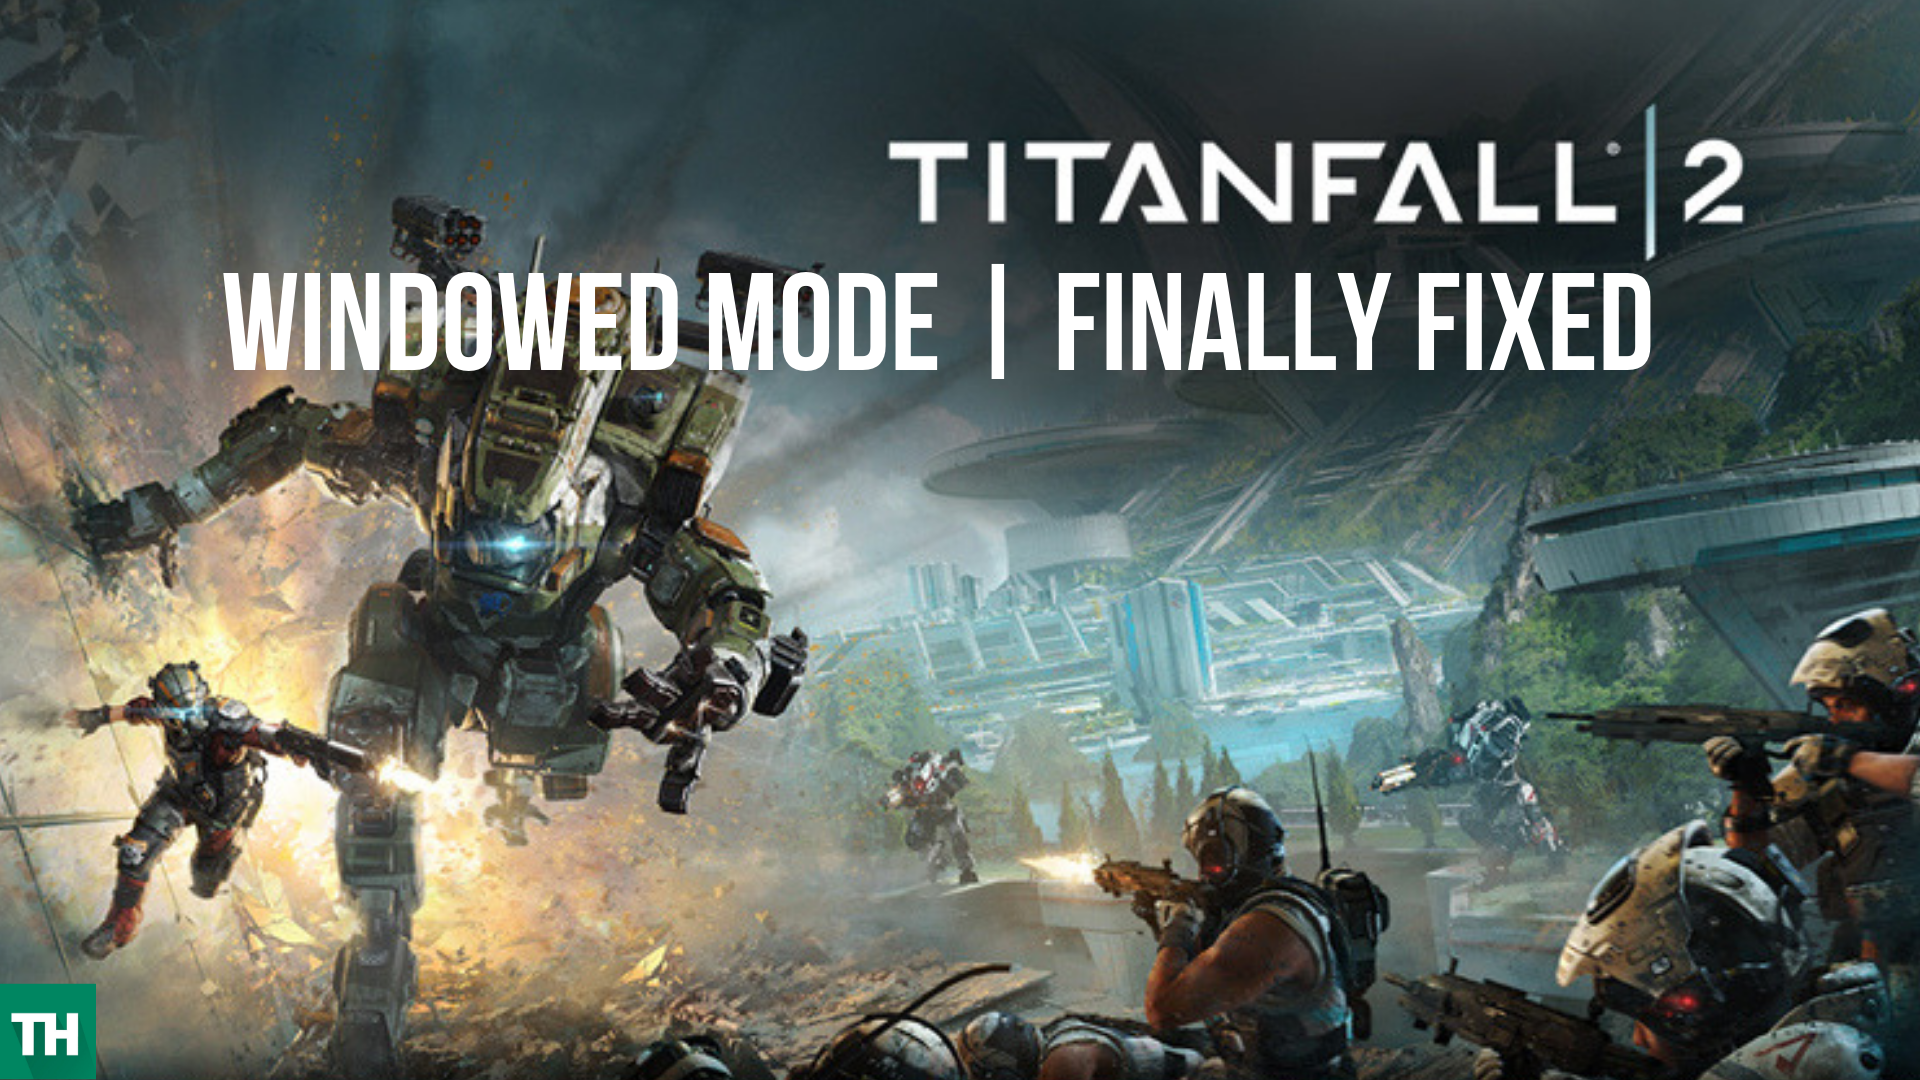 TitanFall 2 windowed mode fix